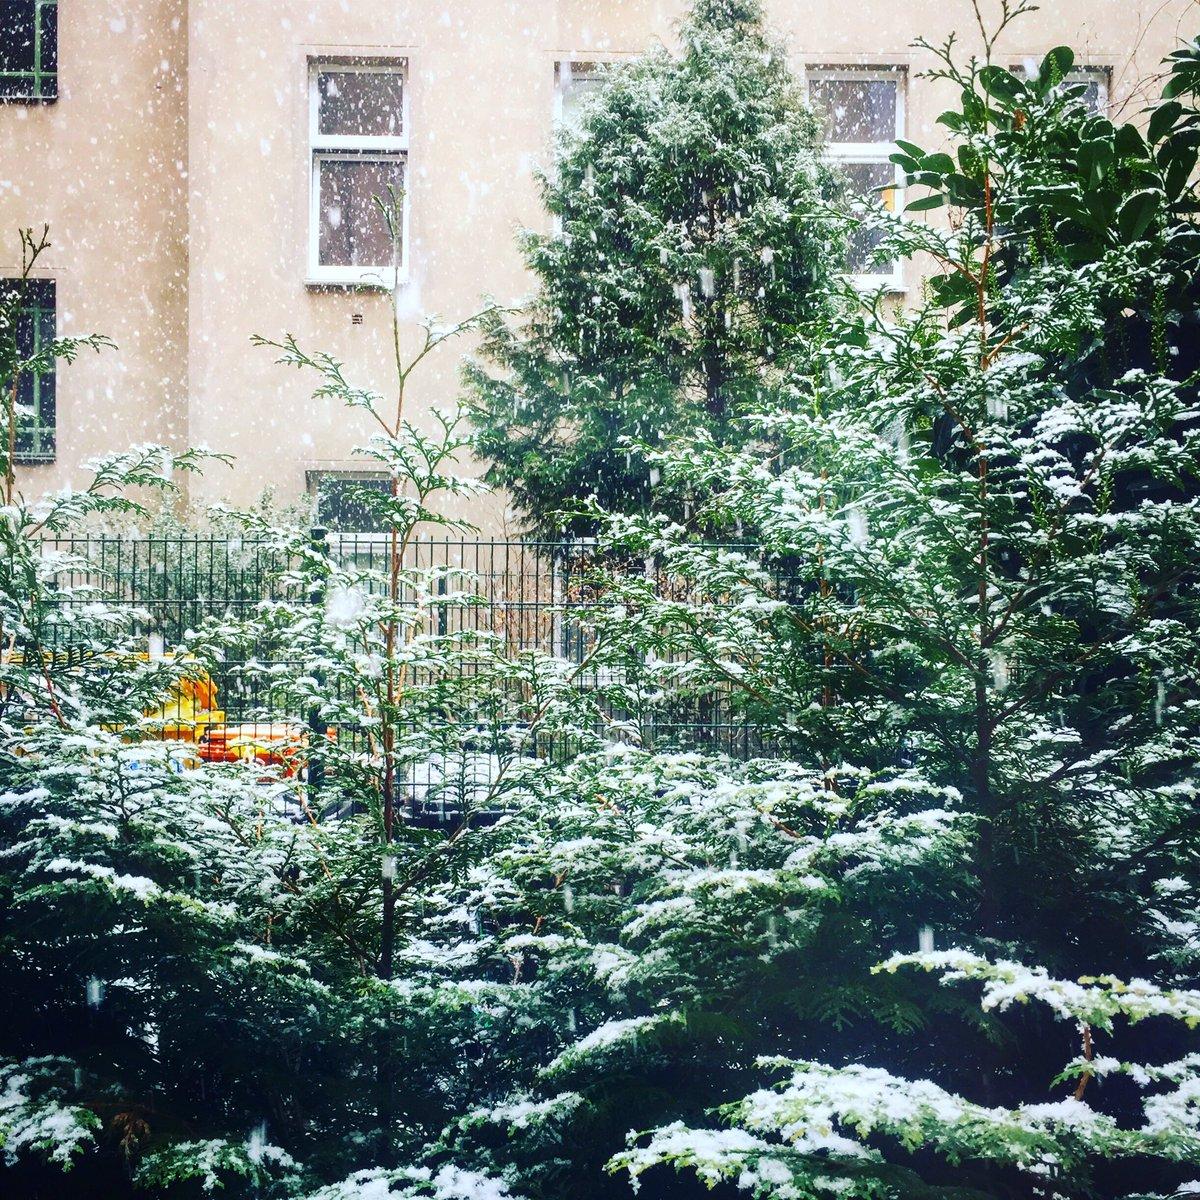 go home Christmas, you're drunk #berlin pic.twitter.com/LucHMC5aze